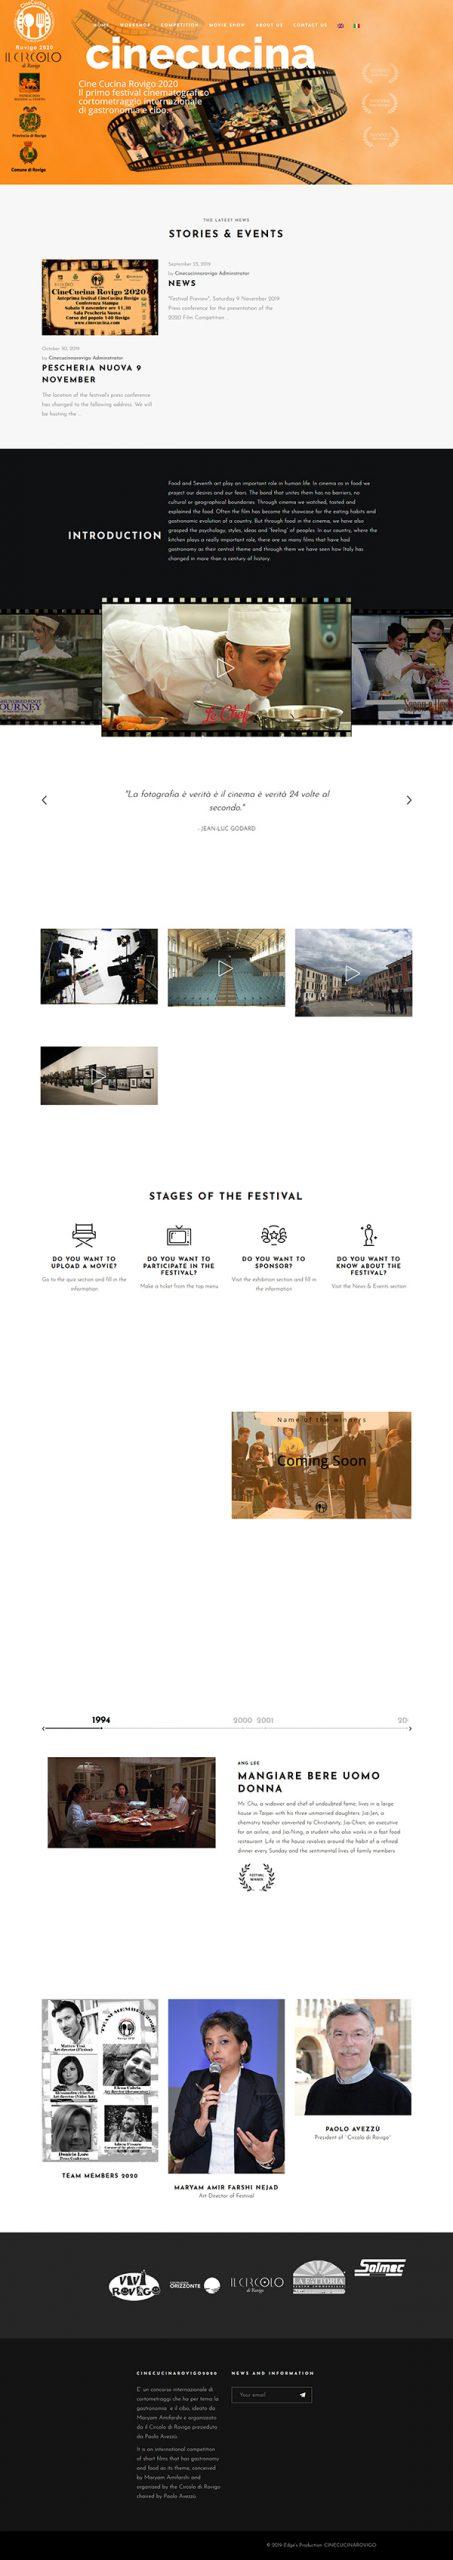 طراحی سایت چینوکوچینا